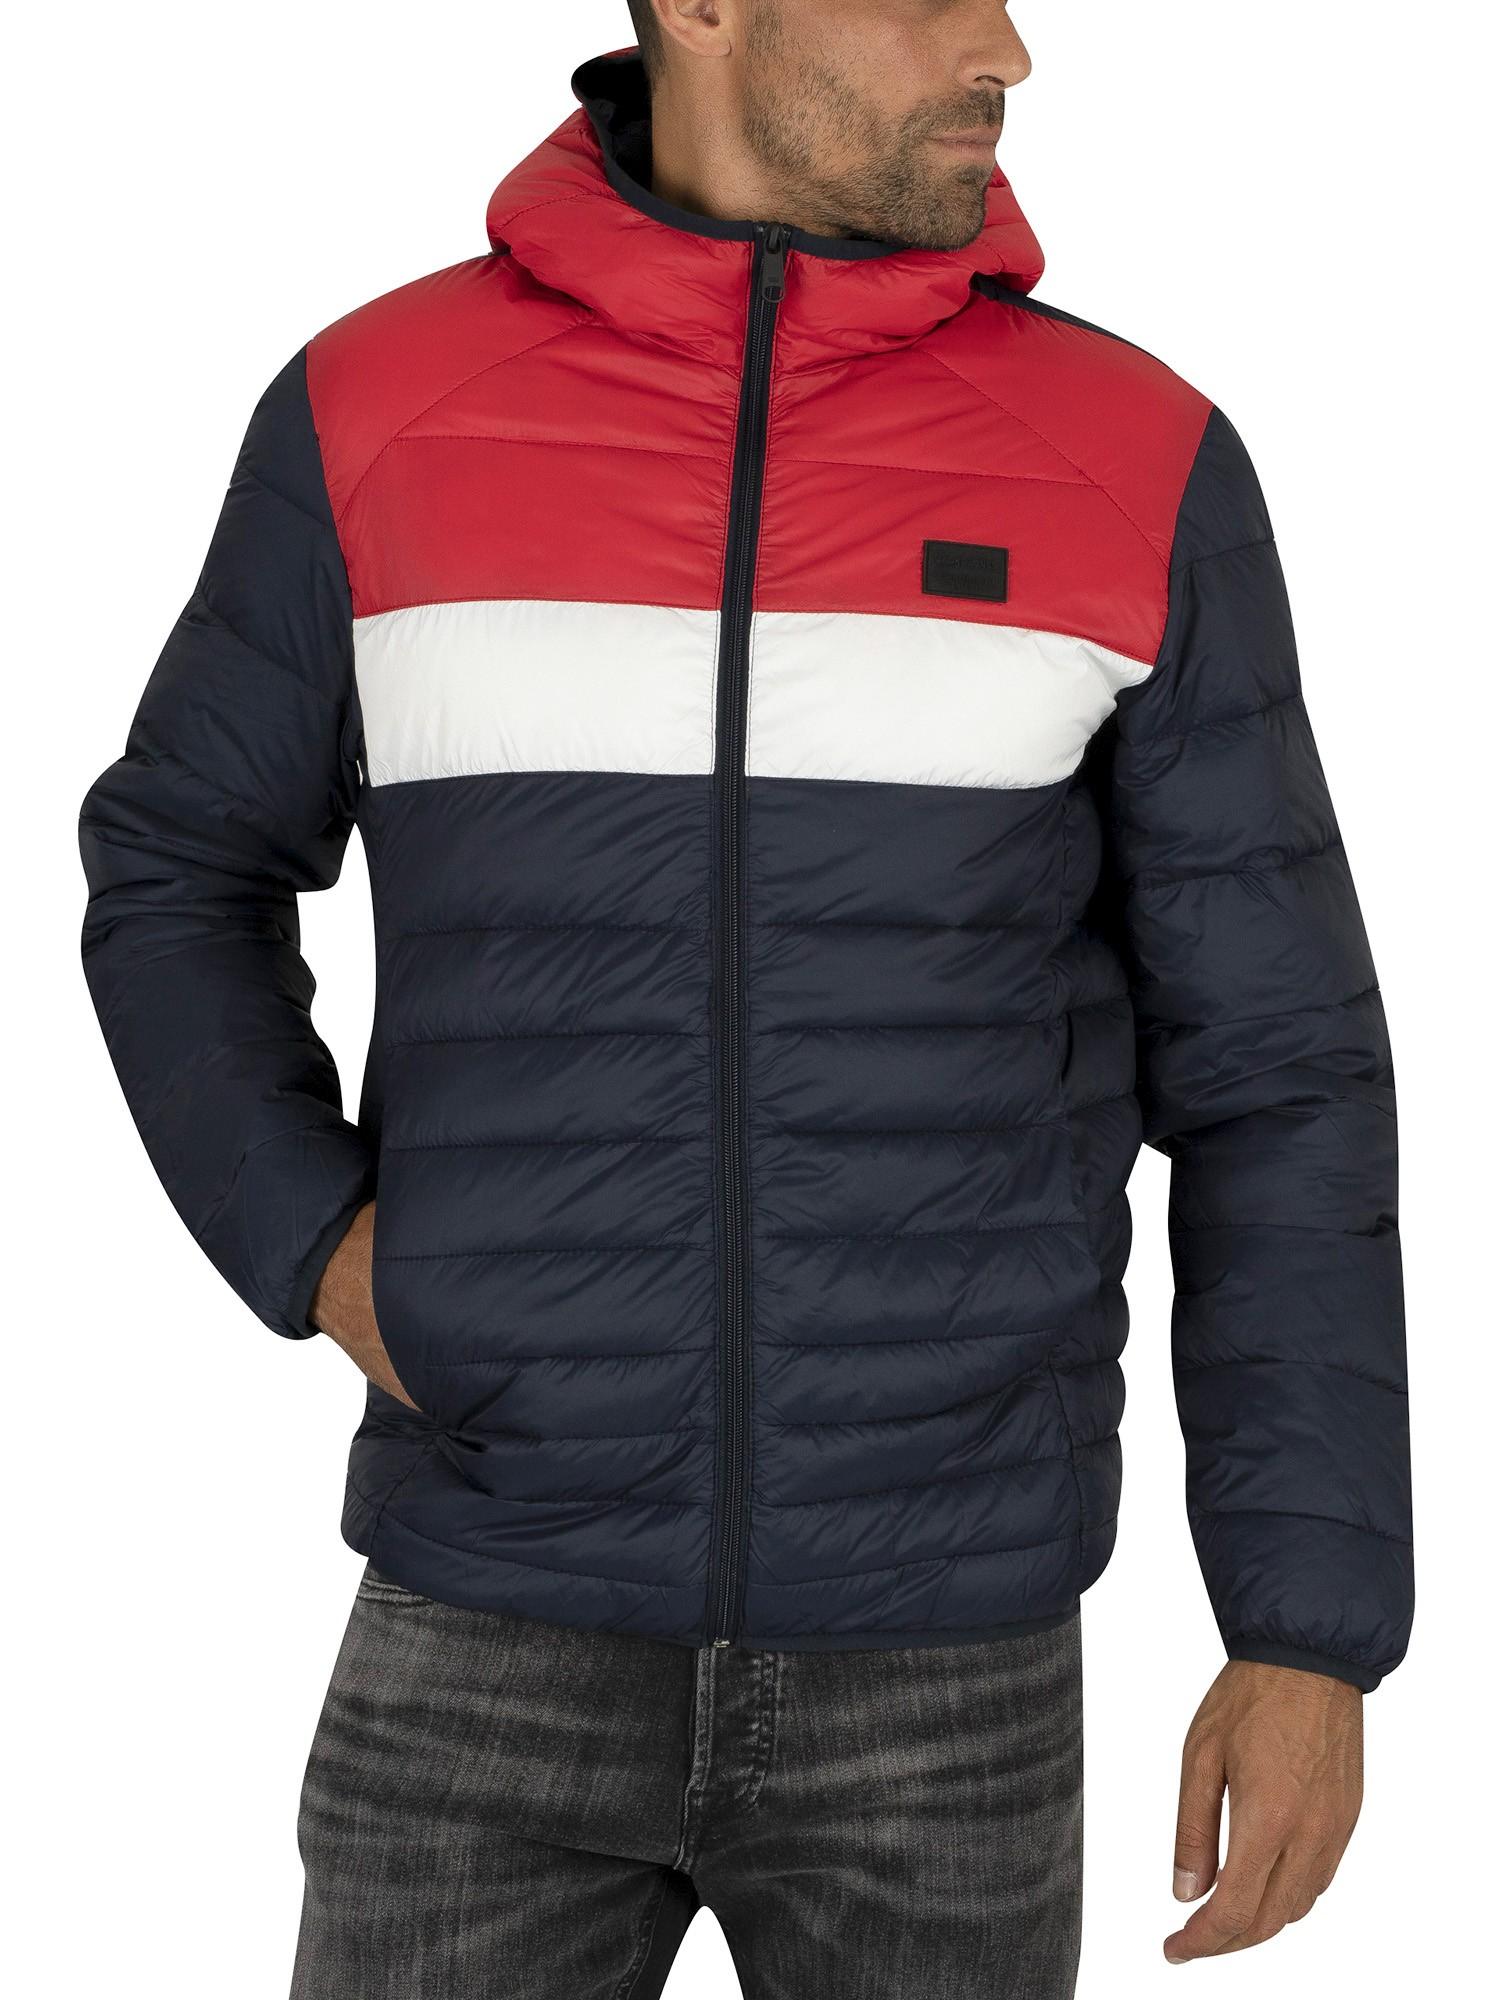 official site new arrive wholesale sales Jack & Jones Bomb Hood Puffer Jacket - Scarlet